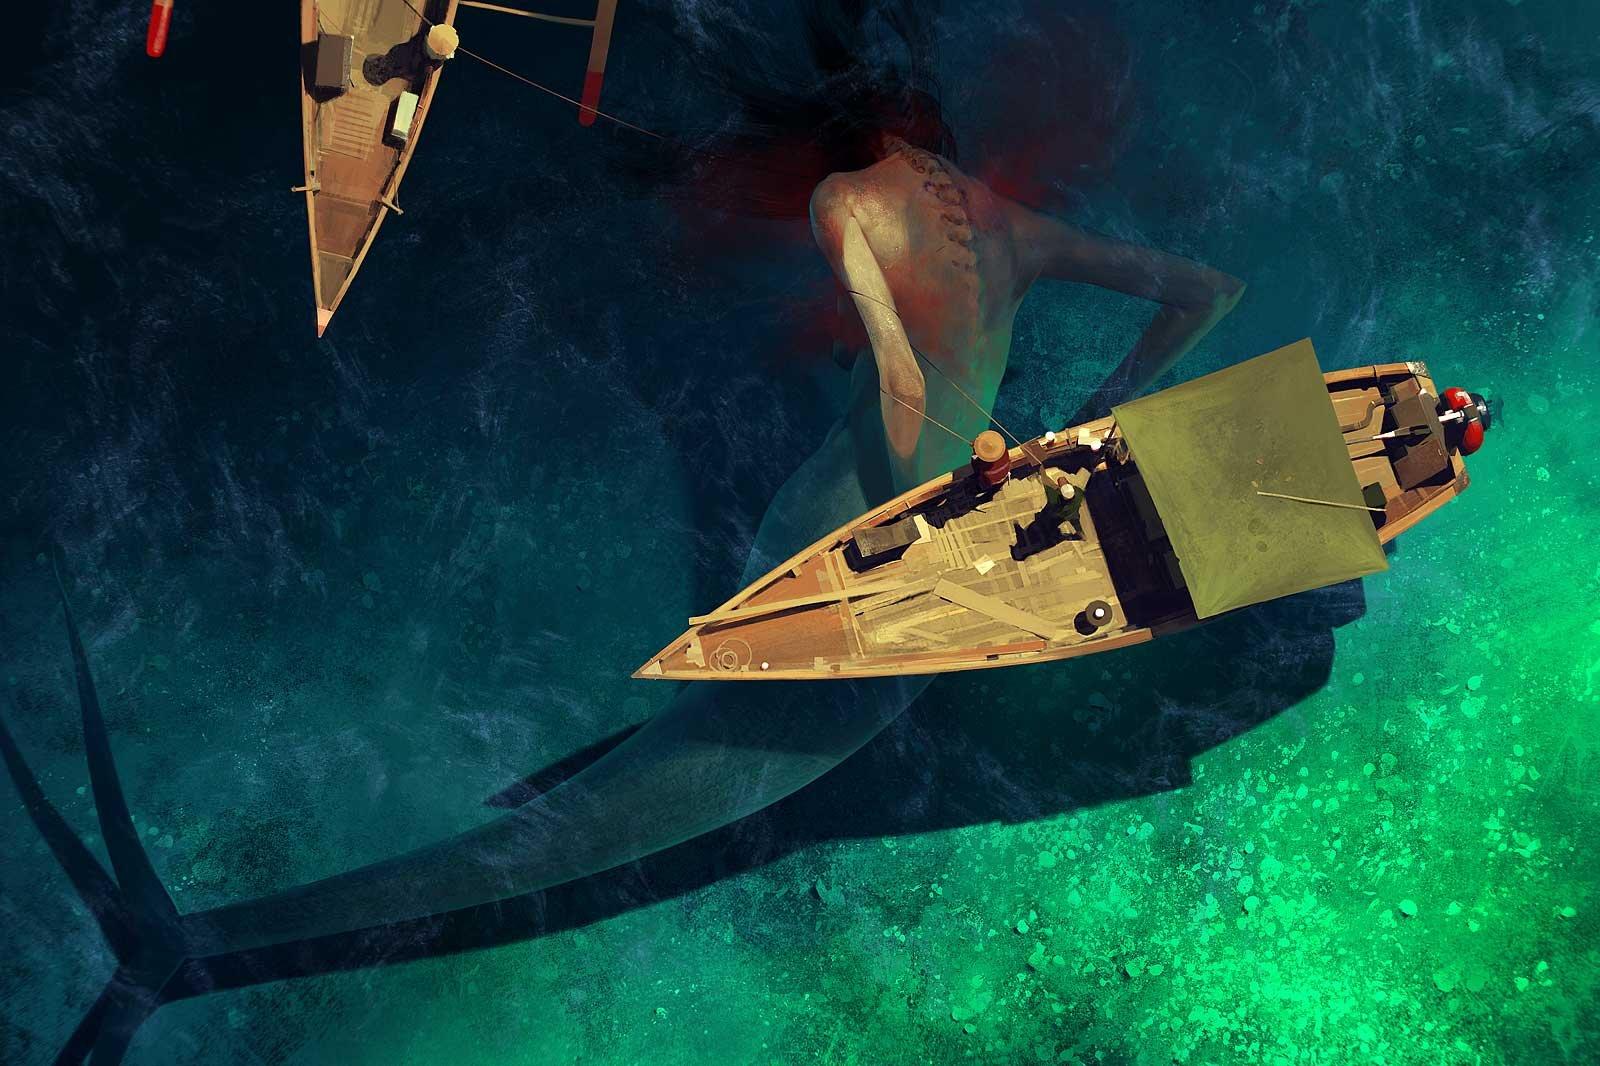 Sergey kolesov mermaid sharpen